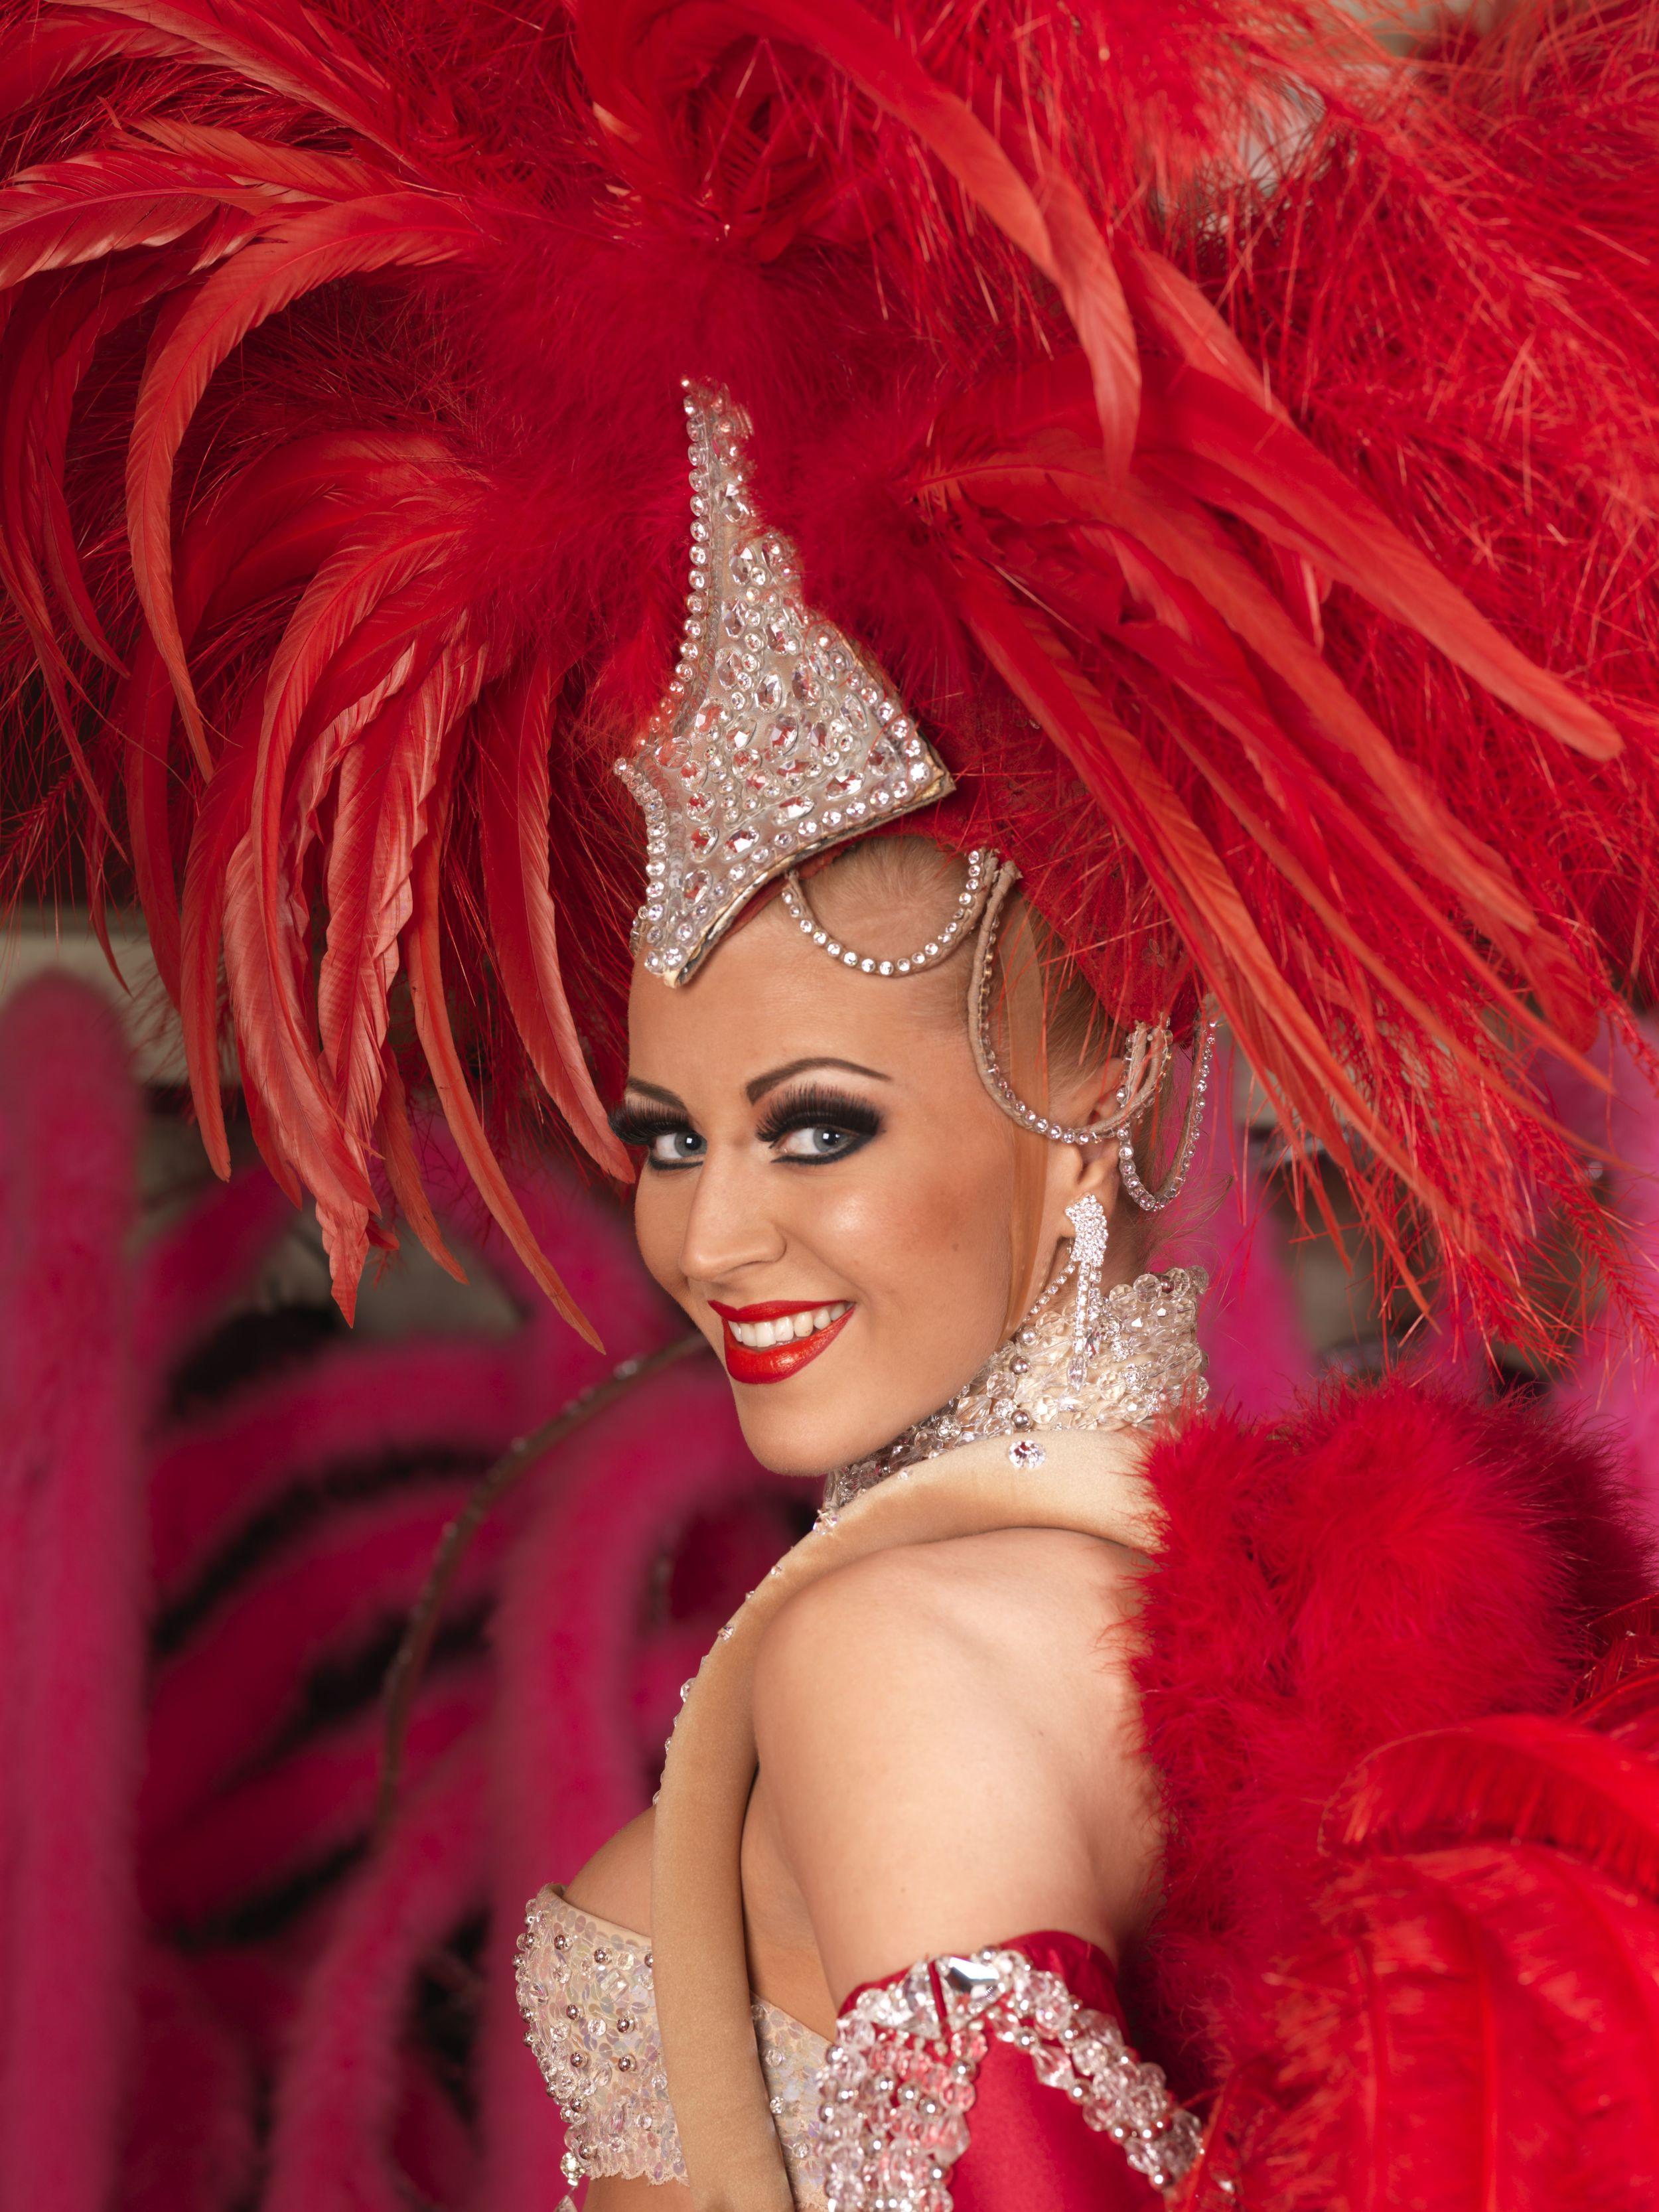 Principal Dancer, Caroline Renno-Raynal